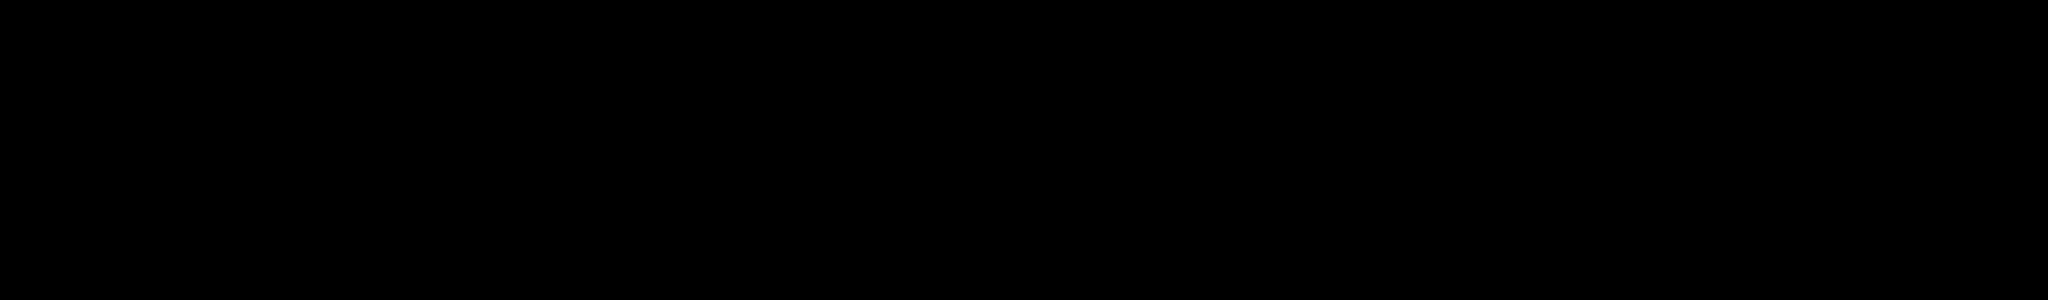 stadtDerFrauen-10